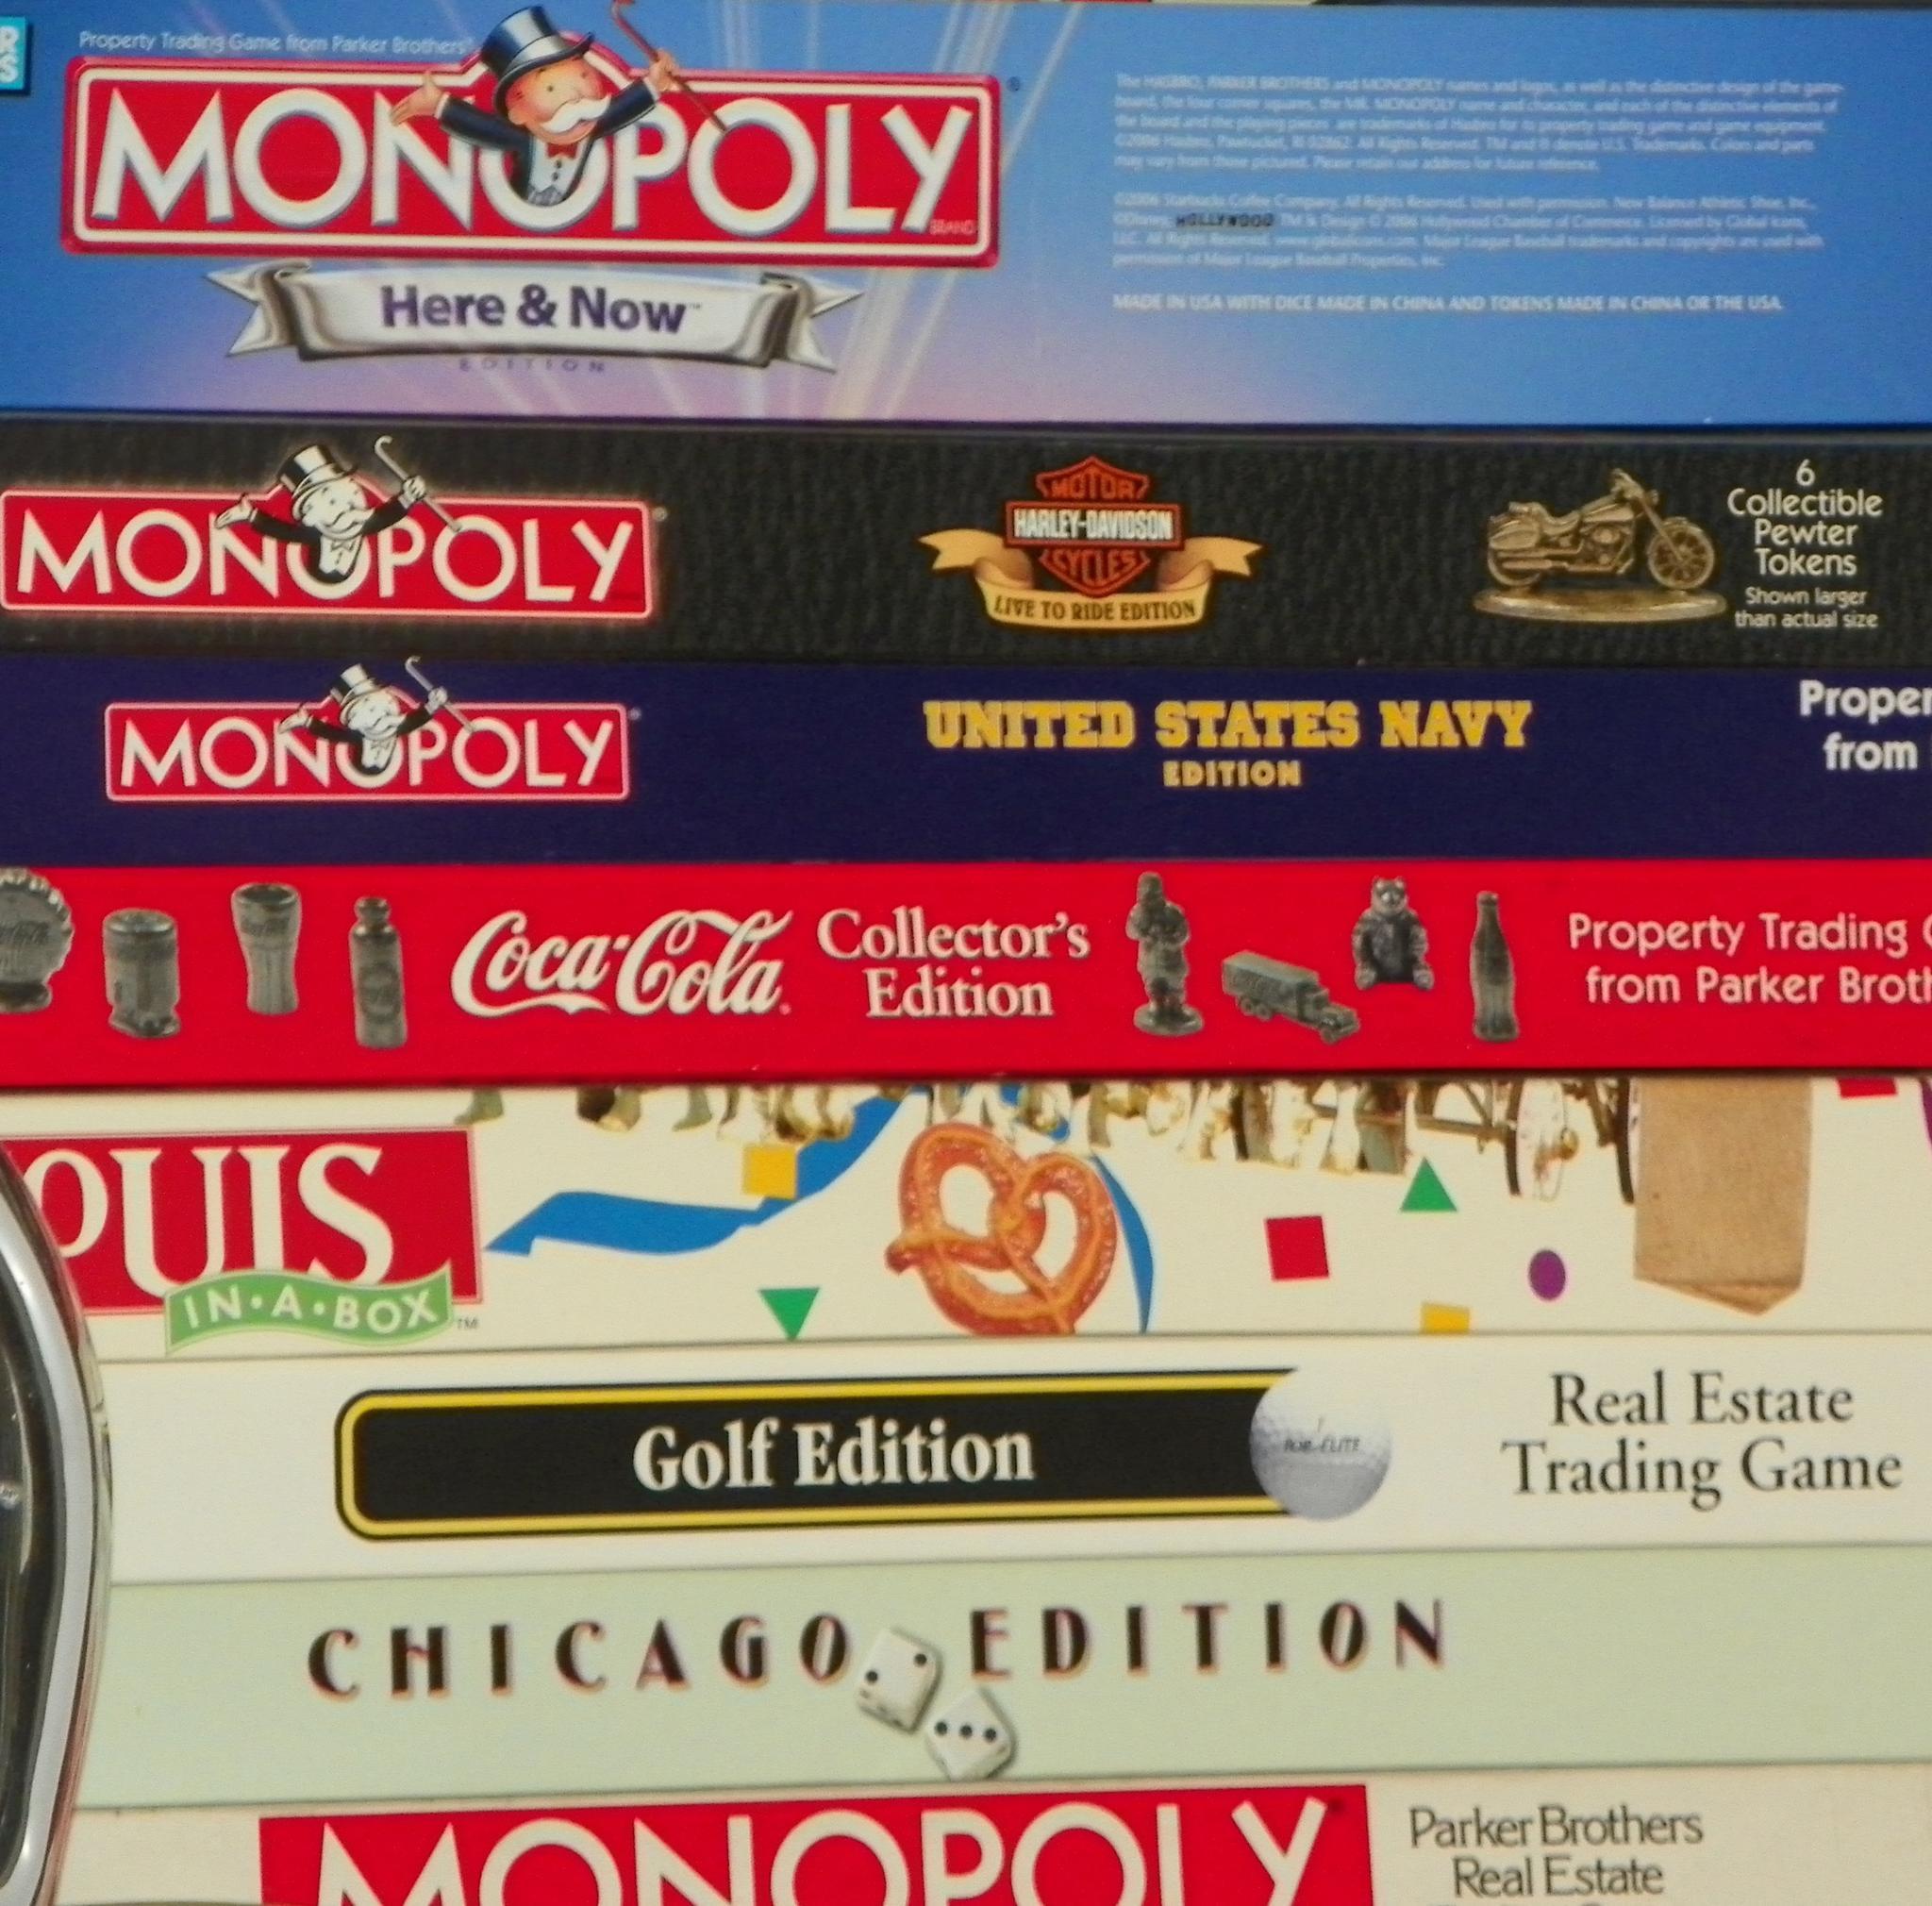 Monopoly Anyone? by ssmjdd